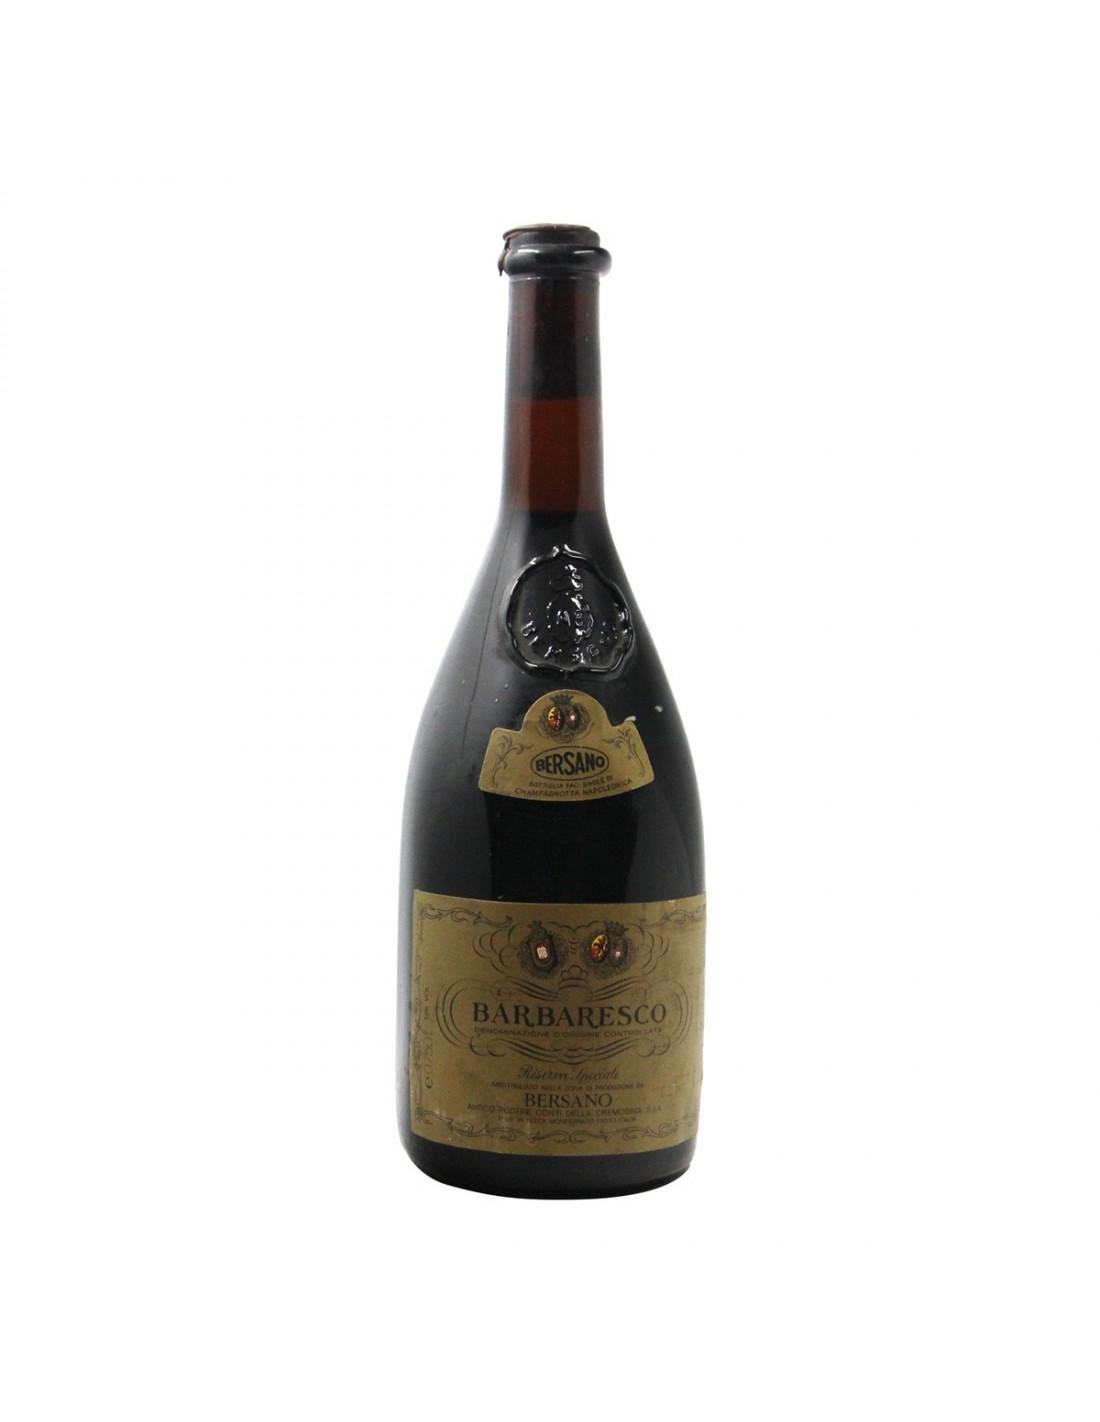 BARBARESCO PODERE CREMOSINA 1974 BERSANO Grandi Bottiglie